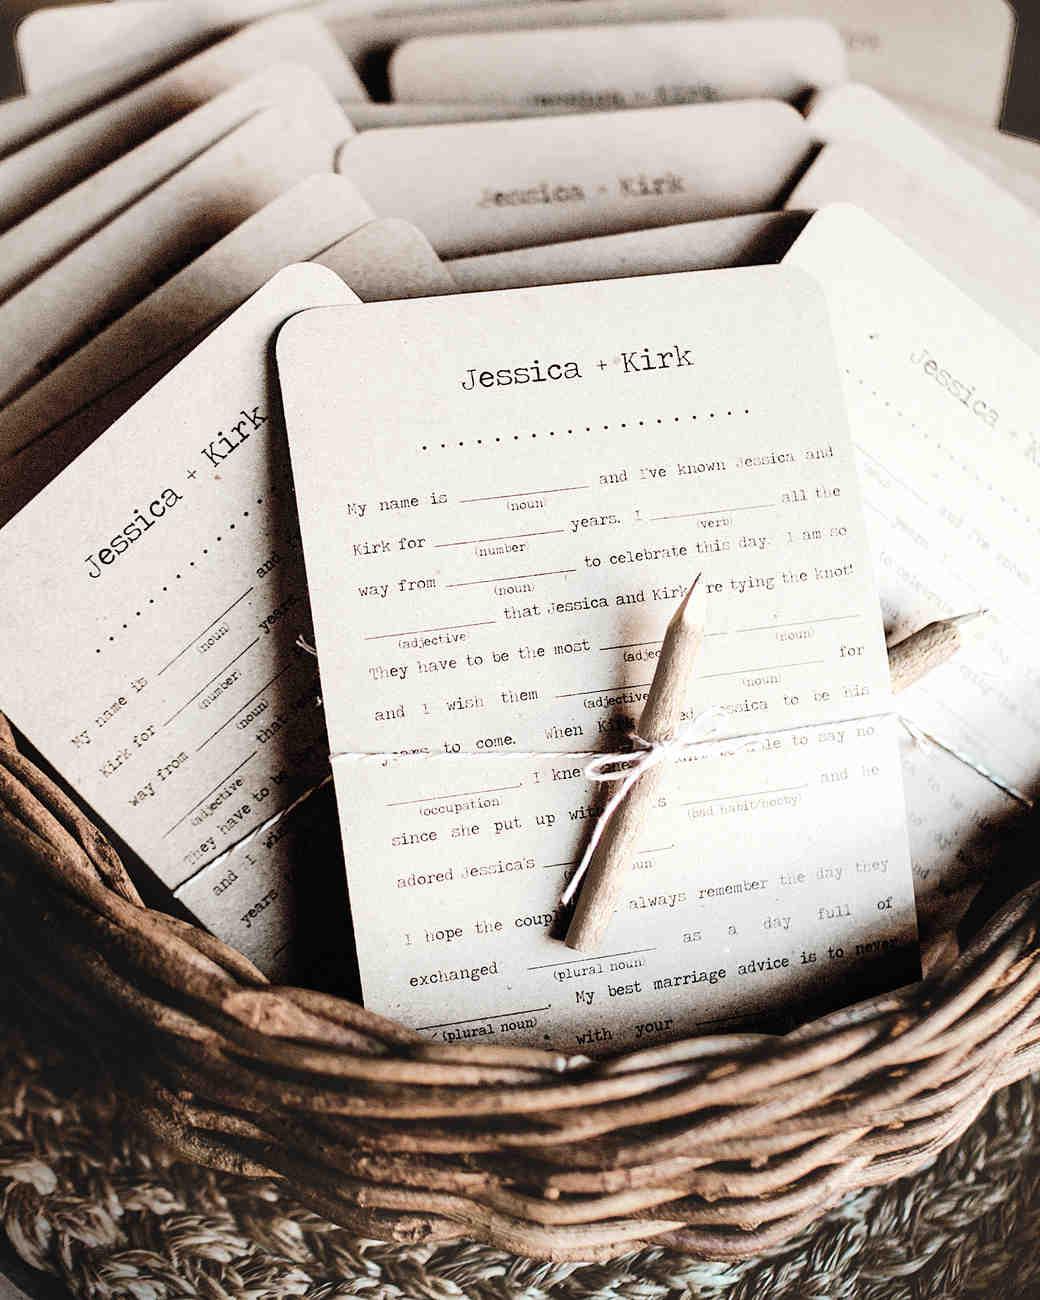 basket-notes-jessicakirk435a-mwds110827.jpg